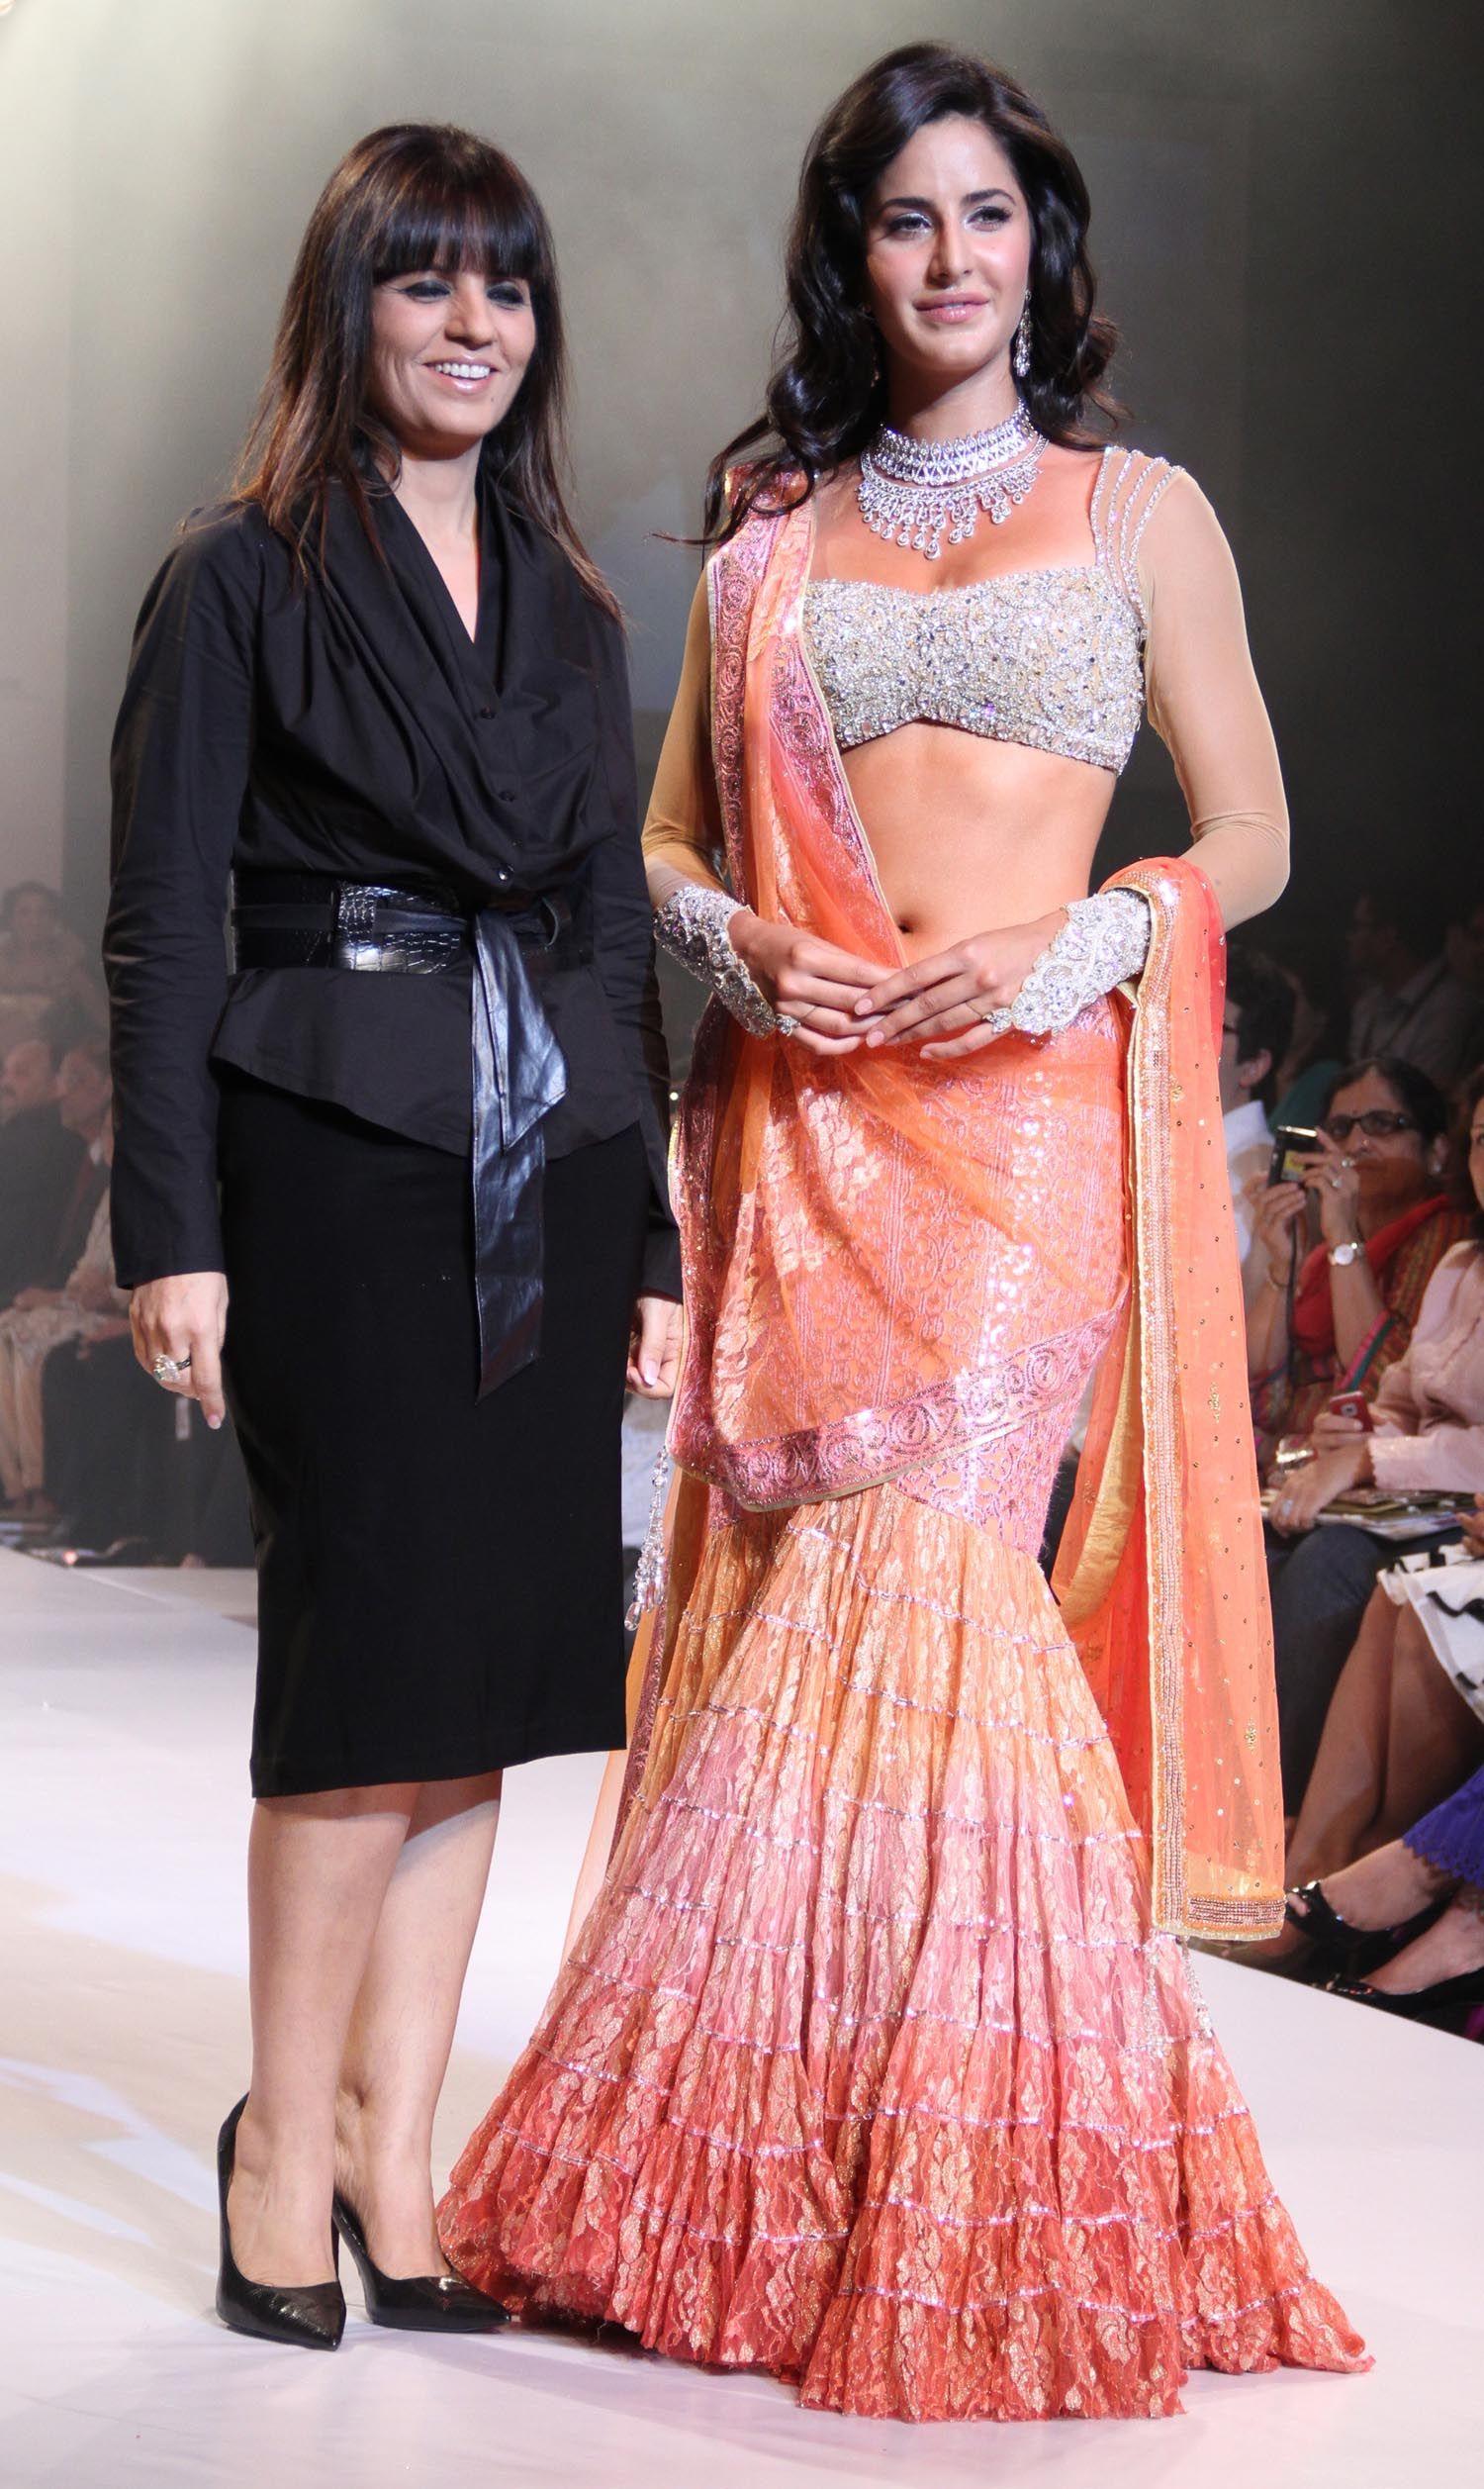 Katrina Kaif for Nakshatra | KATRINA KAIF | Pinterest